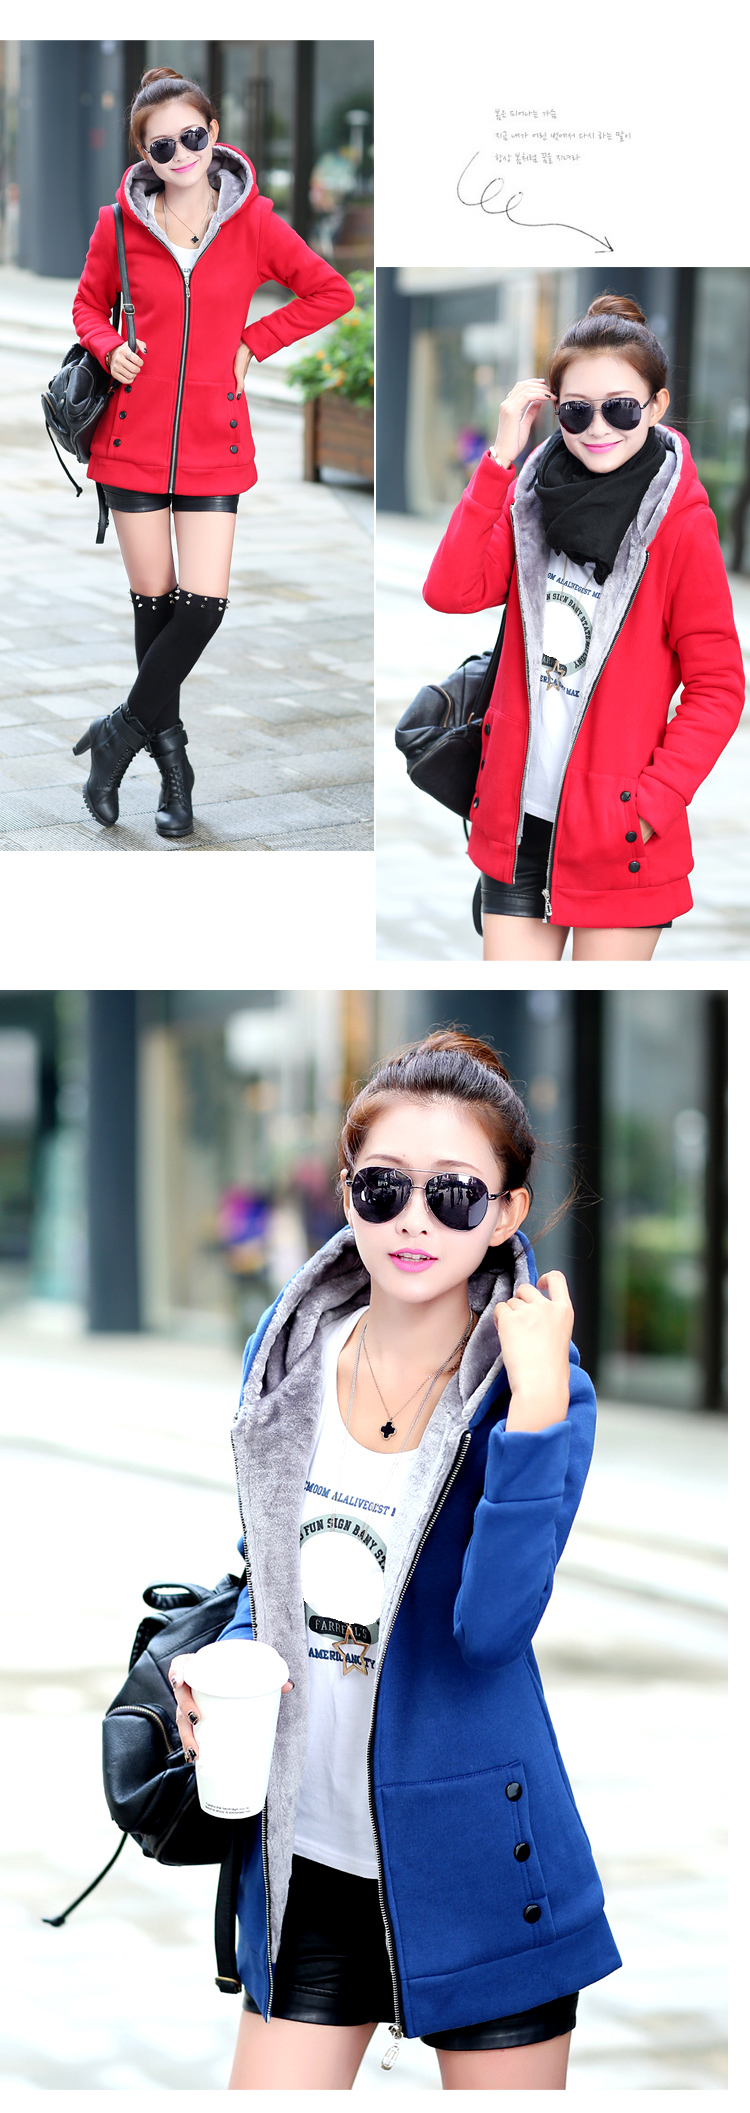 HTB1VukkajnuK1RkSmFPq6AuzFXag Women Fashion Autumn Winter Thicken Sports Cotton Coat ladies Solid Hooded Warm Jacket Outerwear female padded parka overcoat